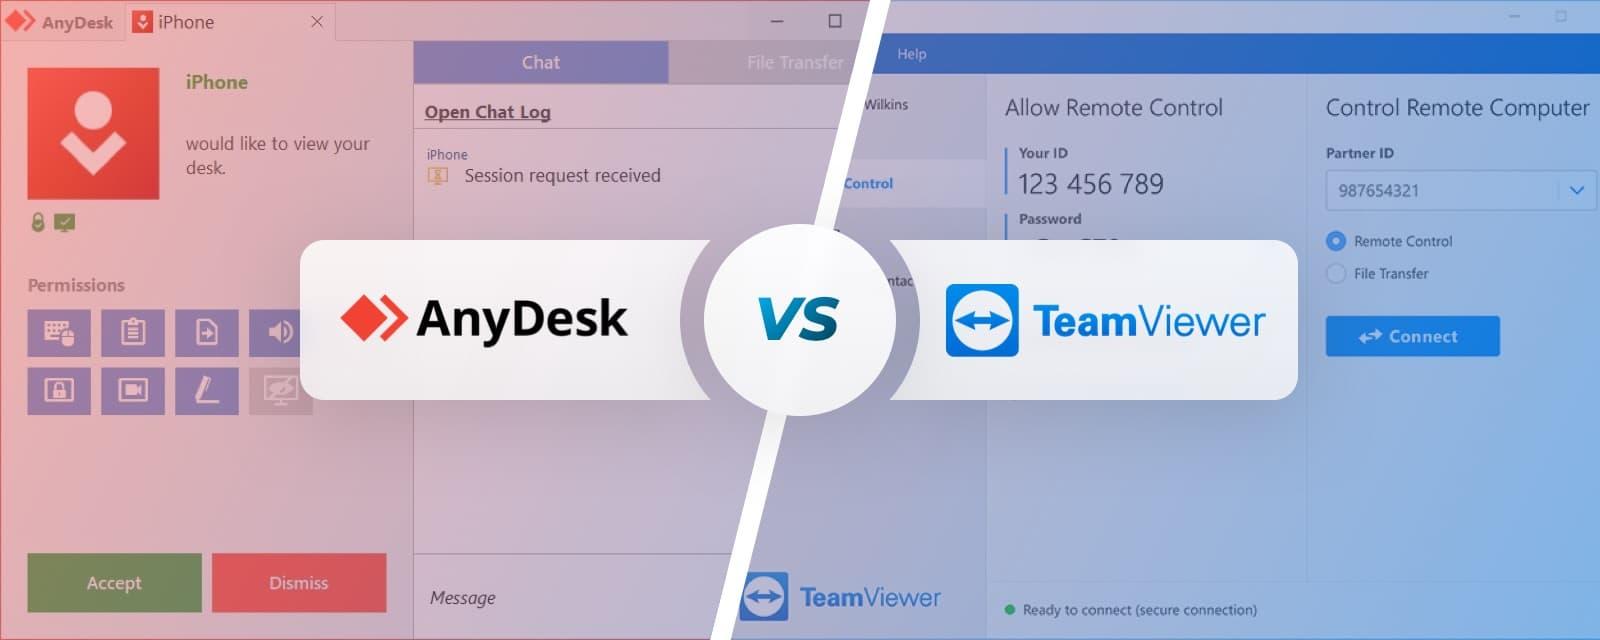 anydesk vs teamviewer